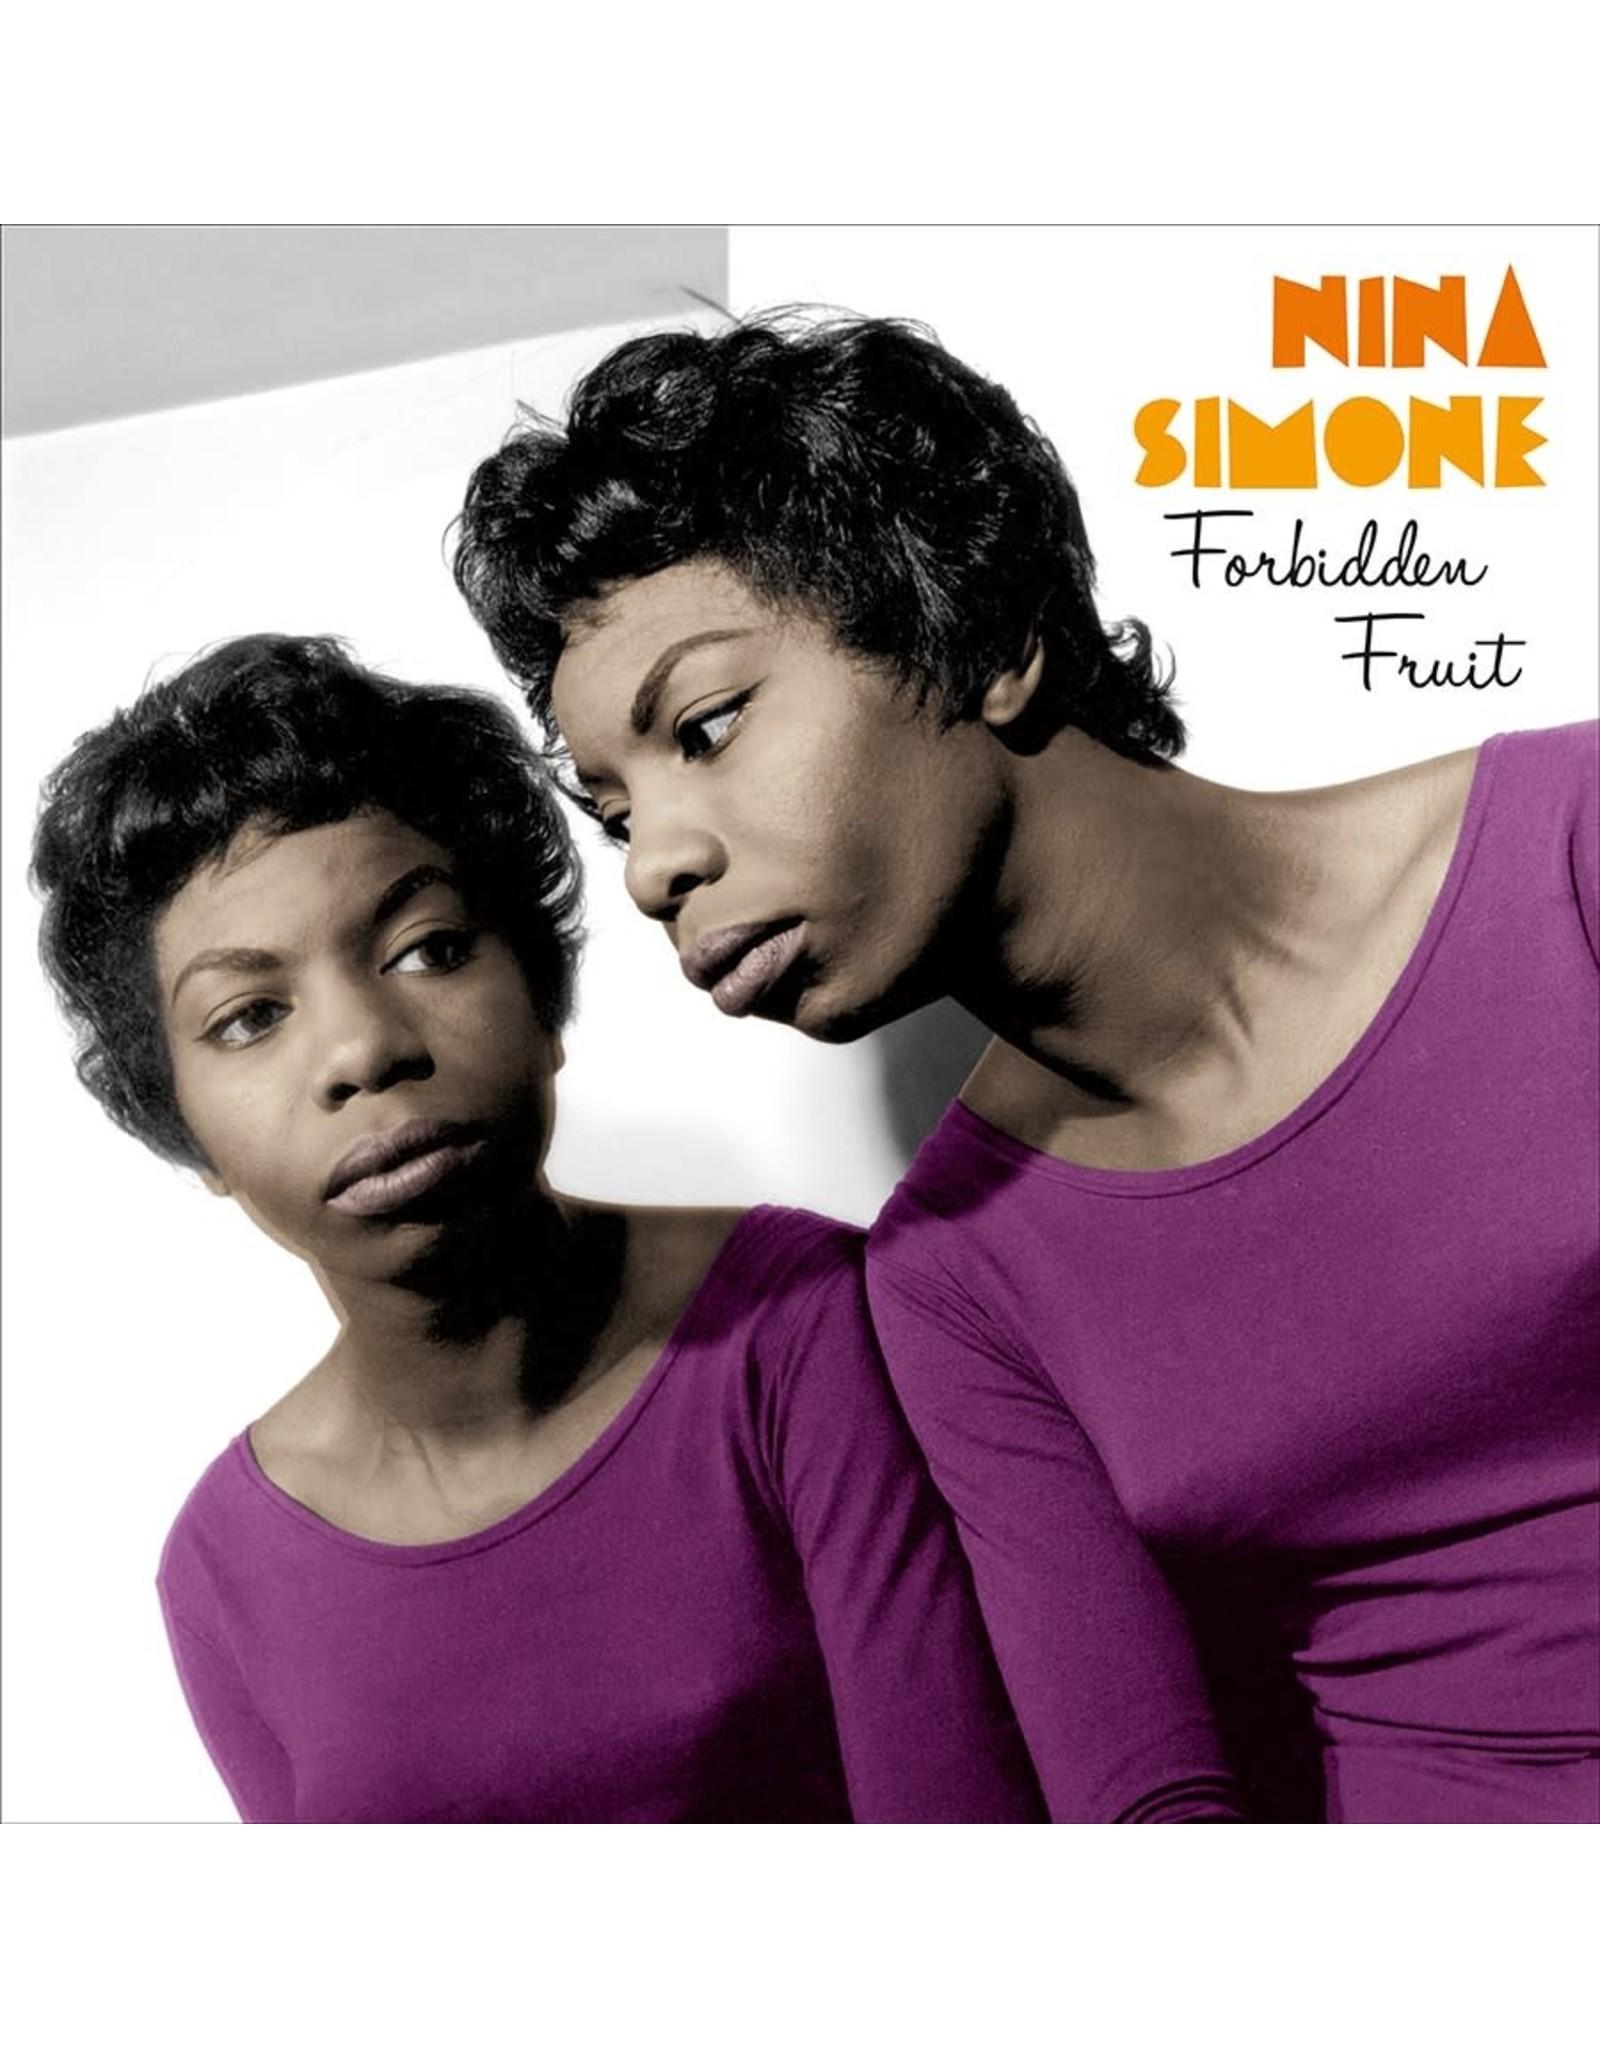 New Vinyl Nina Simone - Forbidden Fruit (Colored) LP